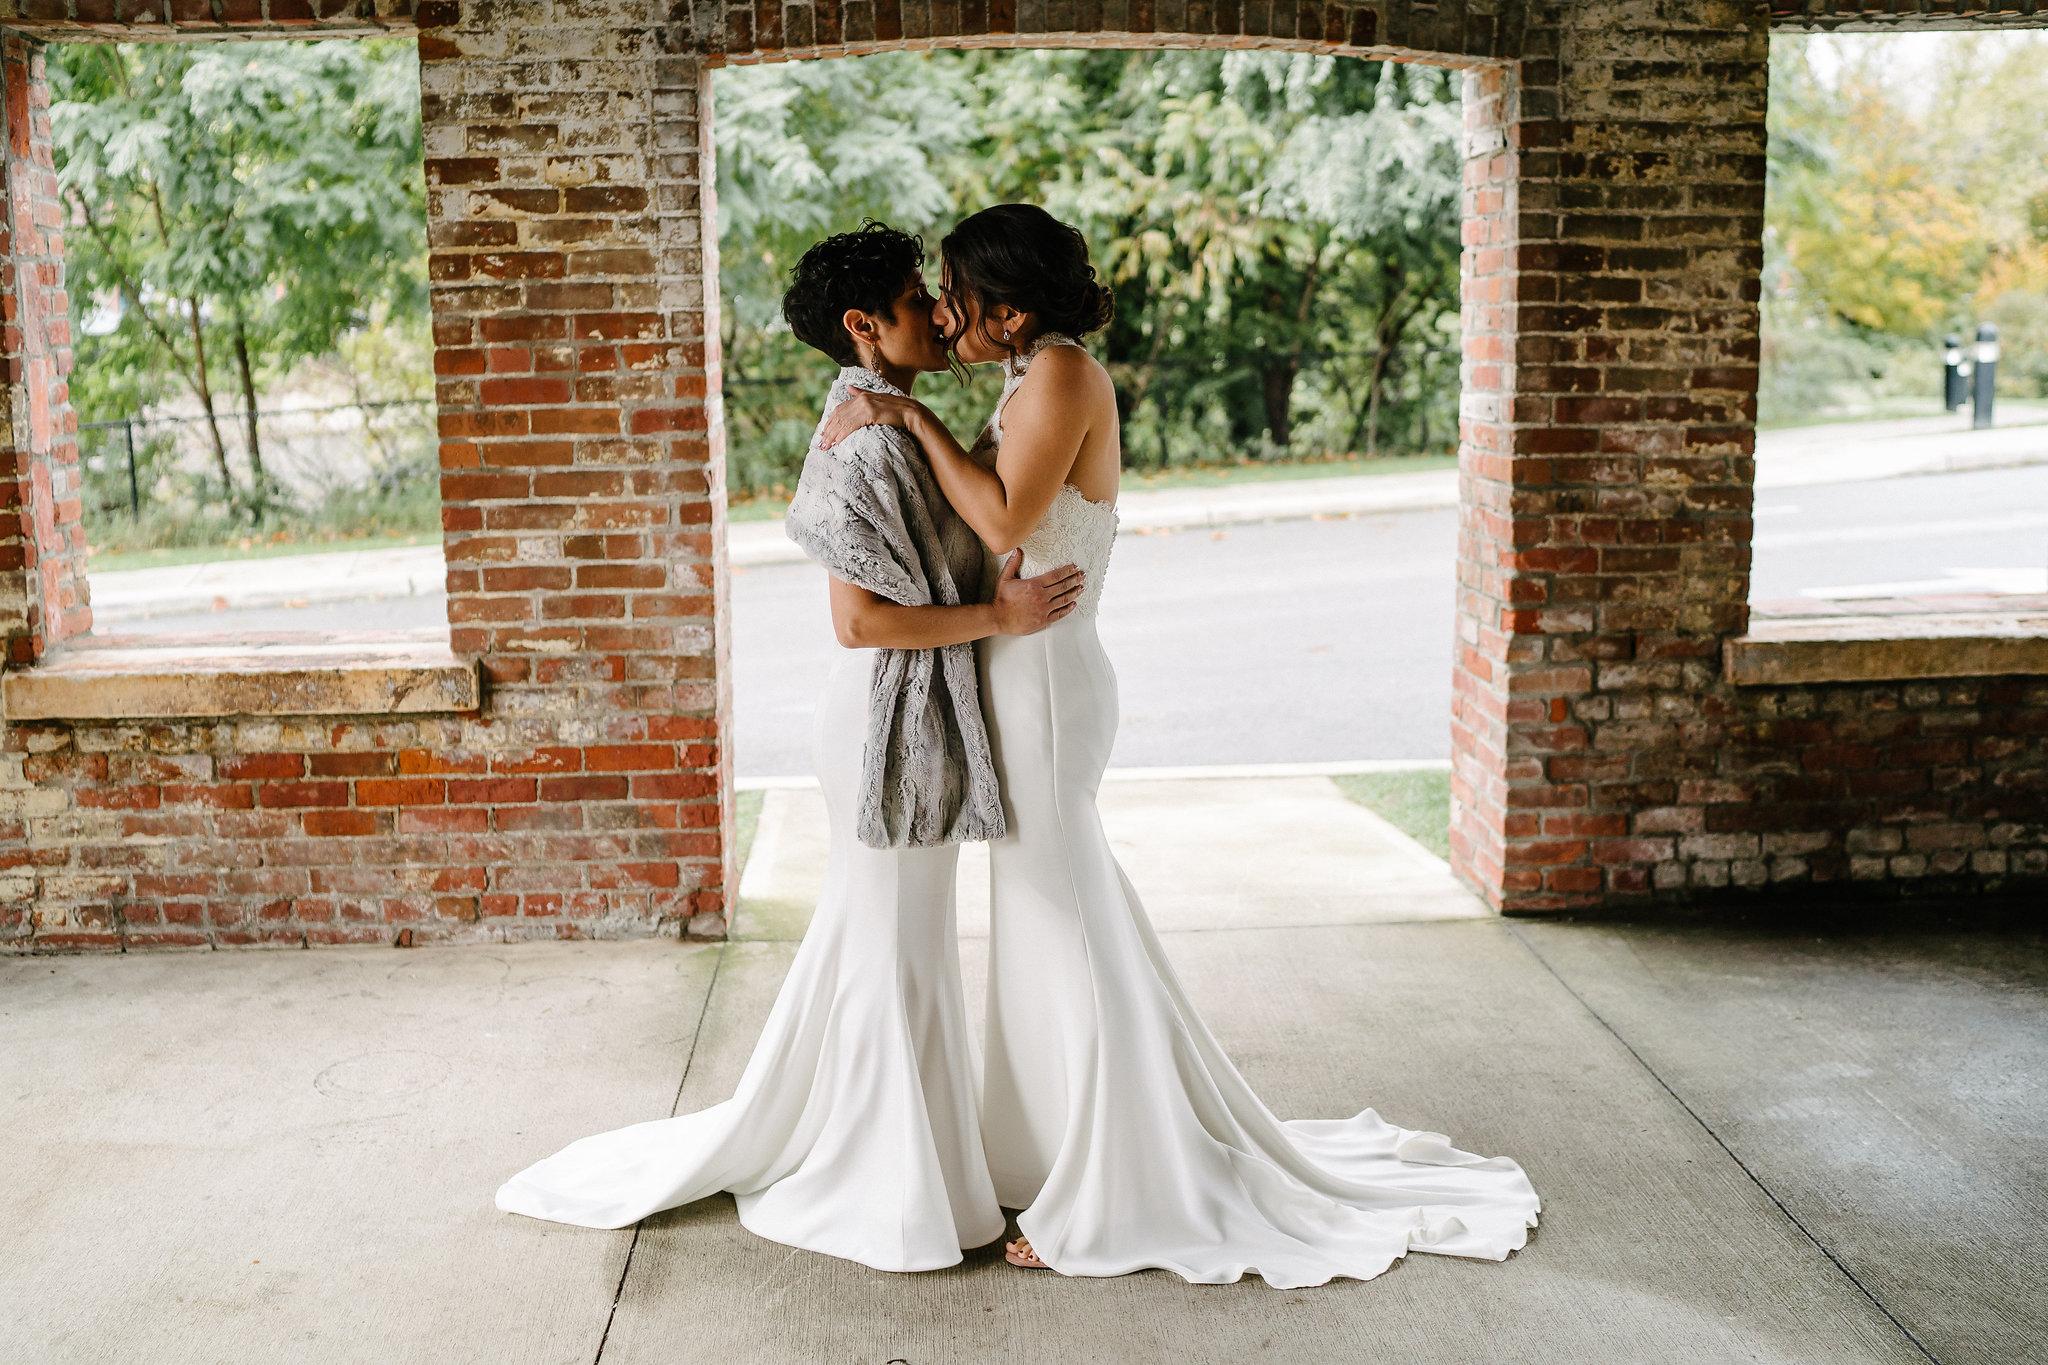 jess-elissa-wedding-103.jpg